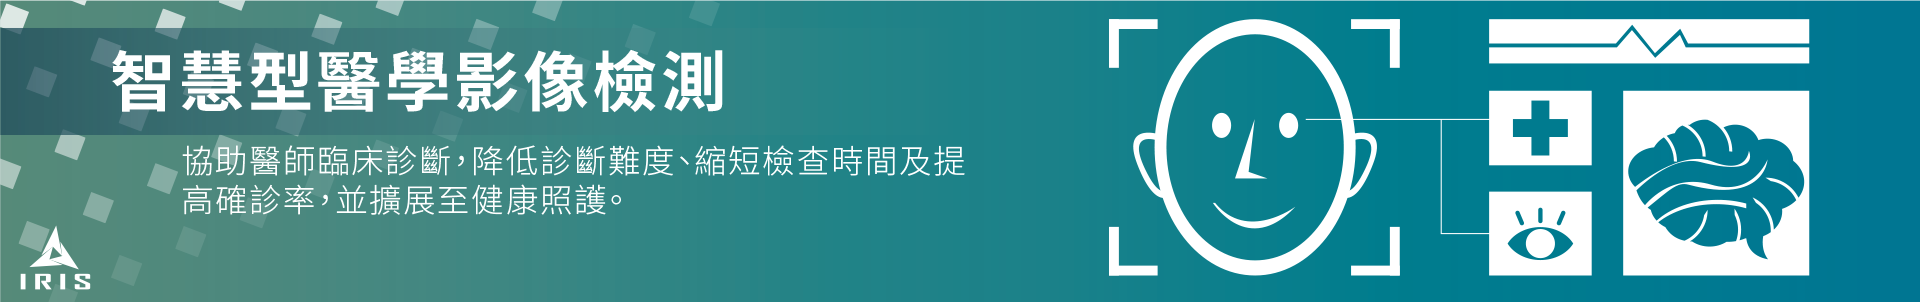 Banner_2020-02